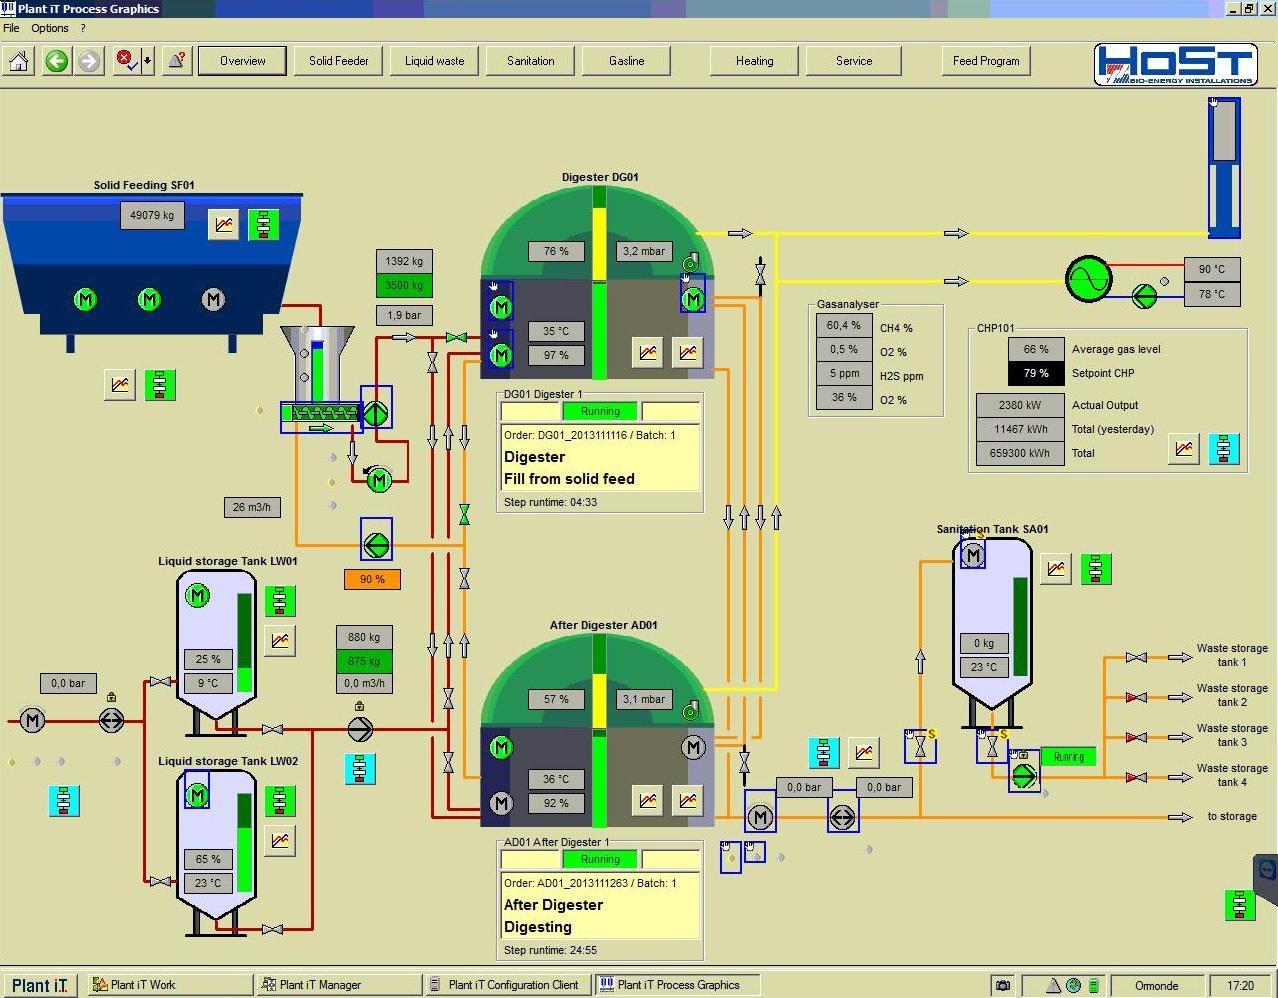 Biogas plant Ormonde - HoSt - HoSt